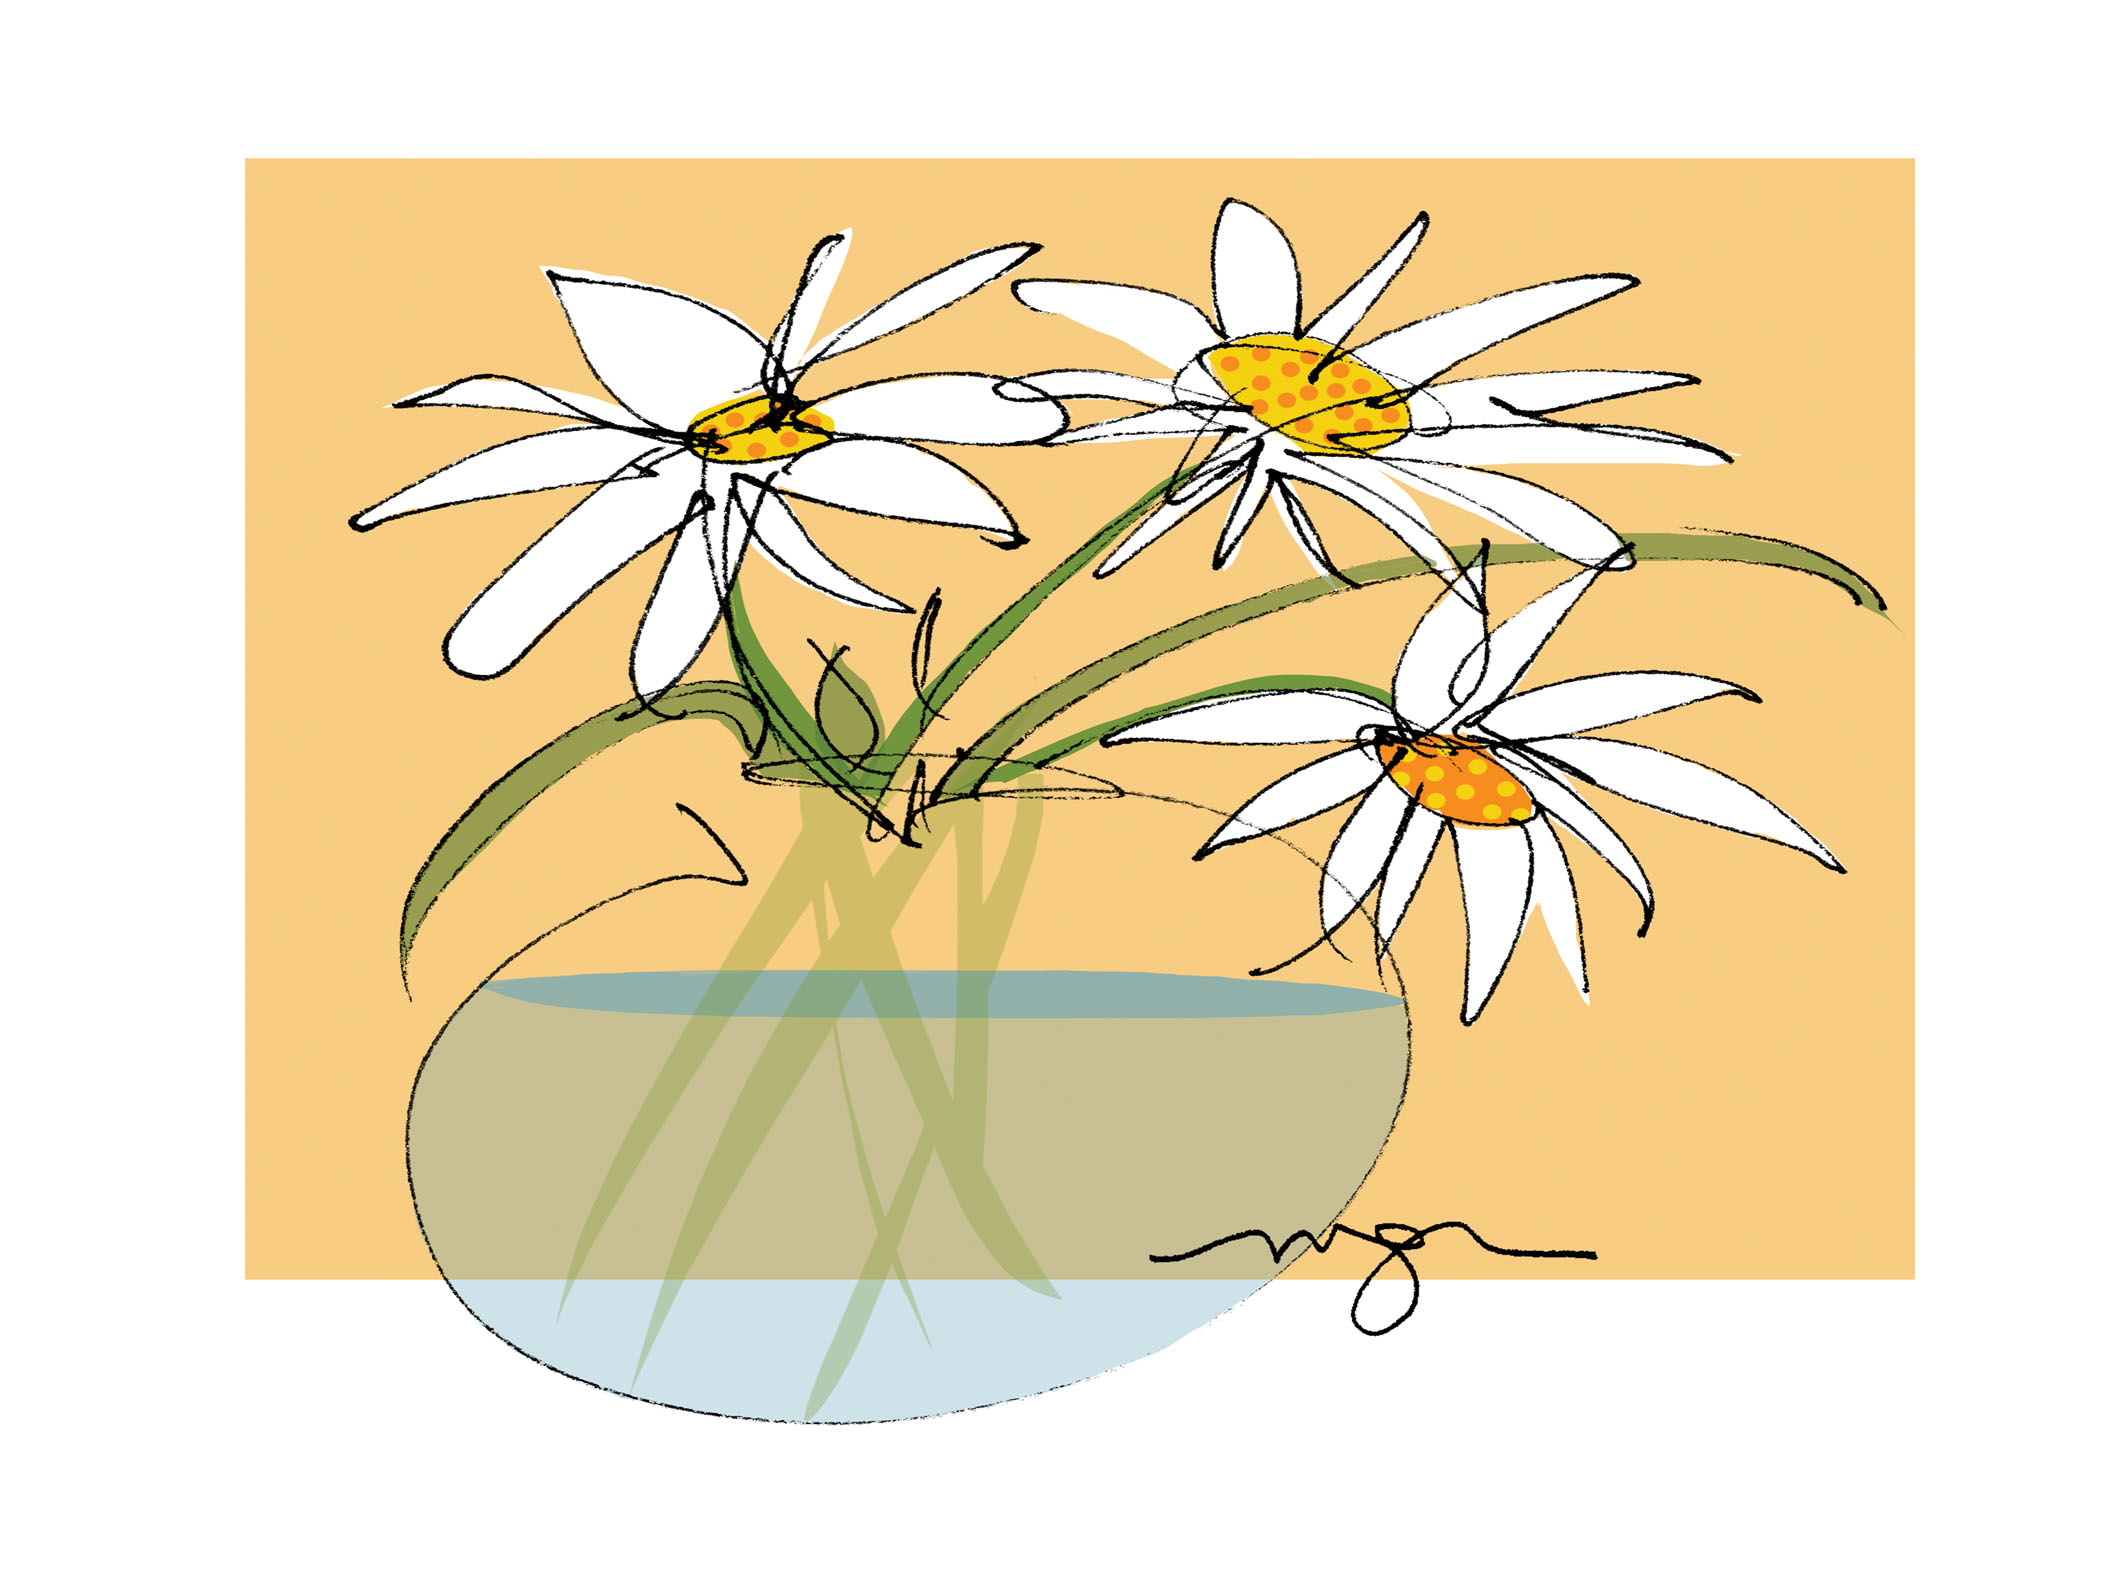 20496926-MarilynMacGregor_DaisyBowl_DrawingDigitalColor_12x16_65.jpg